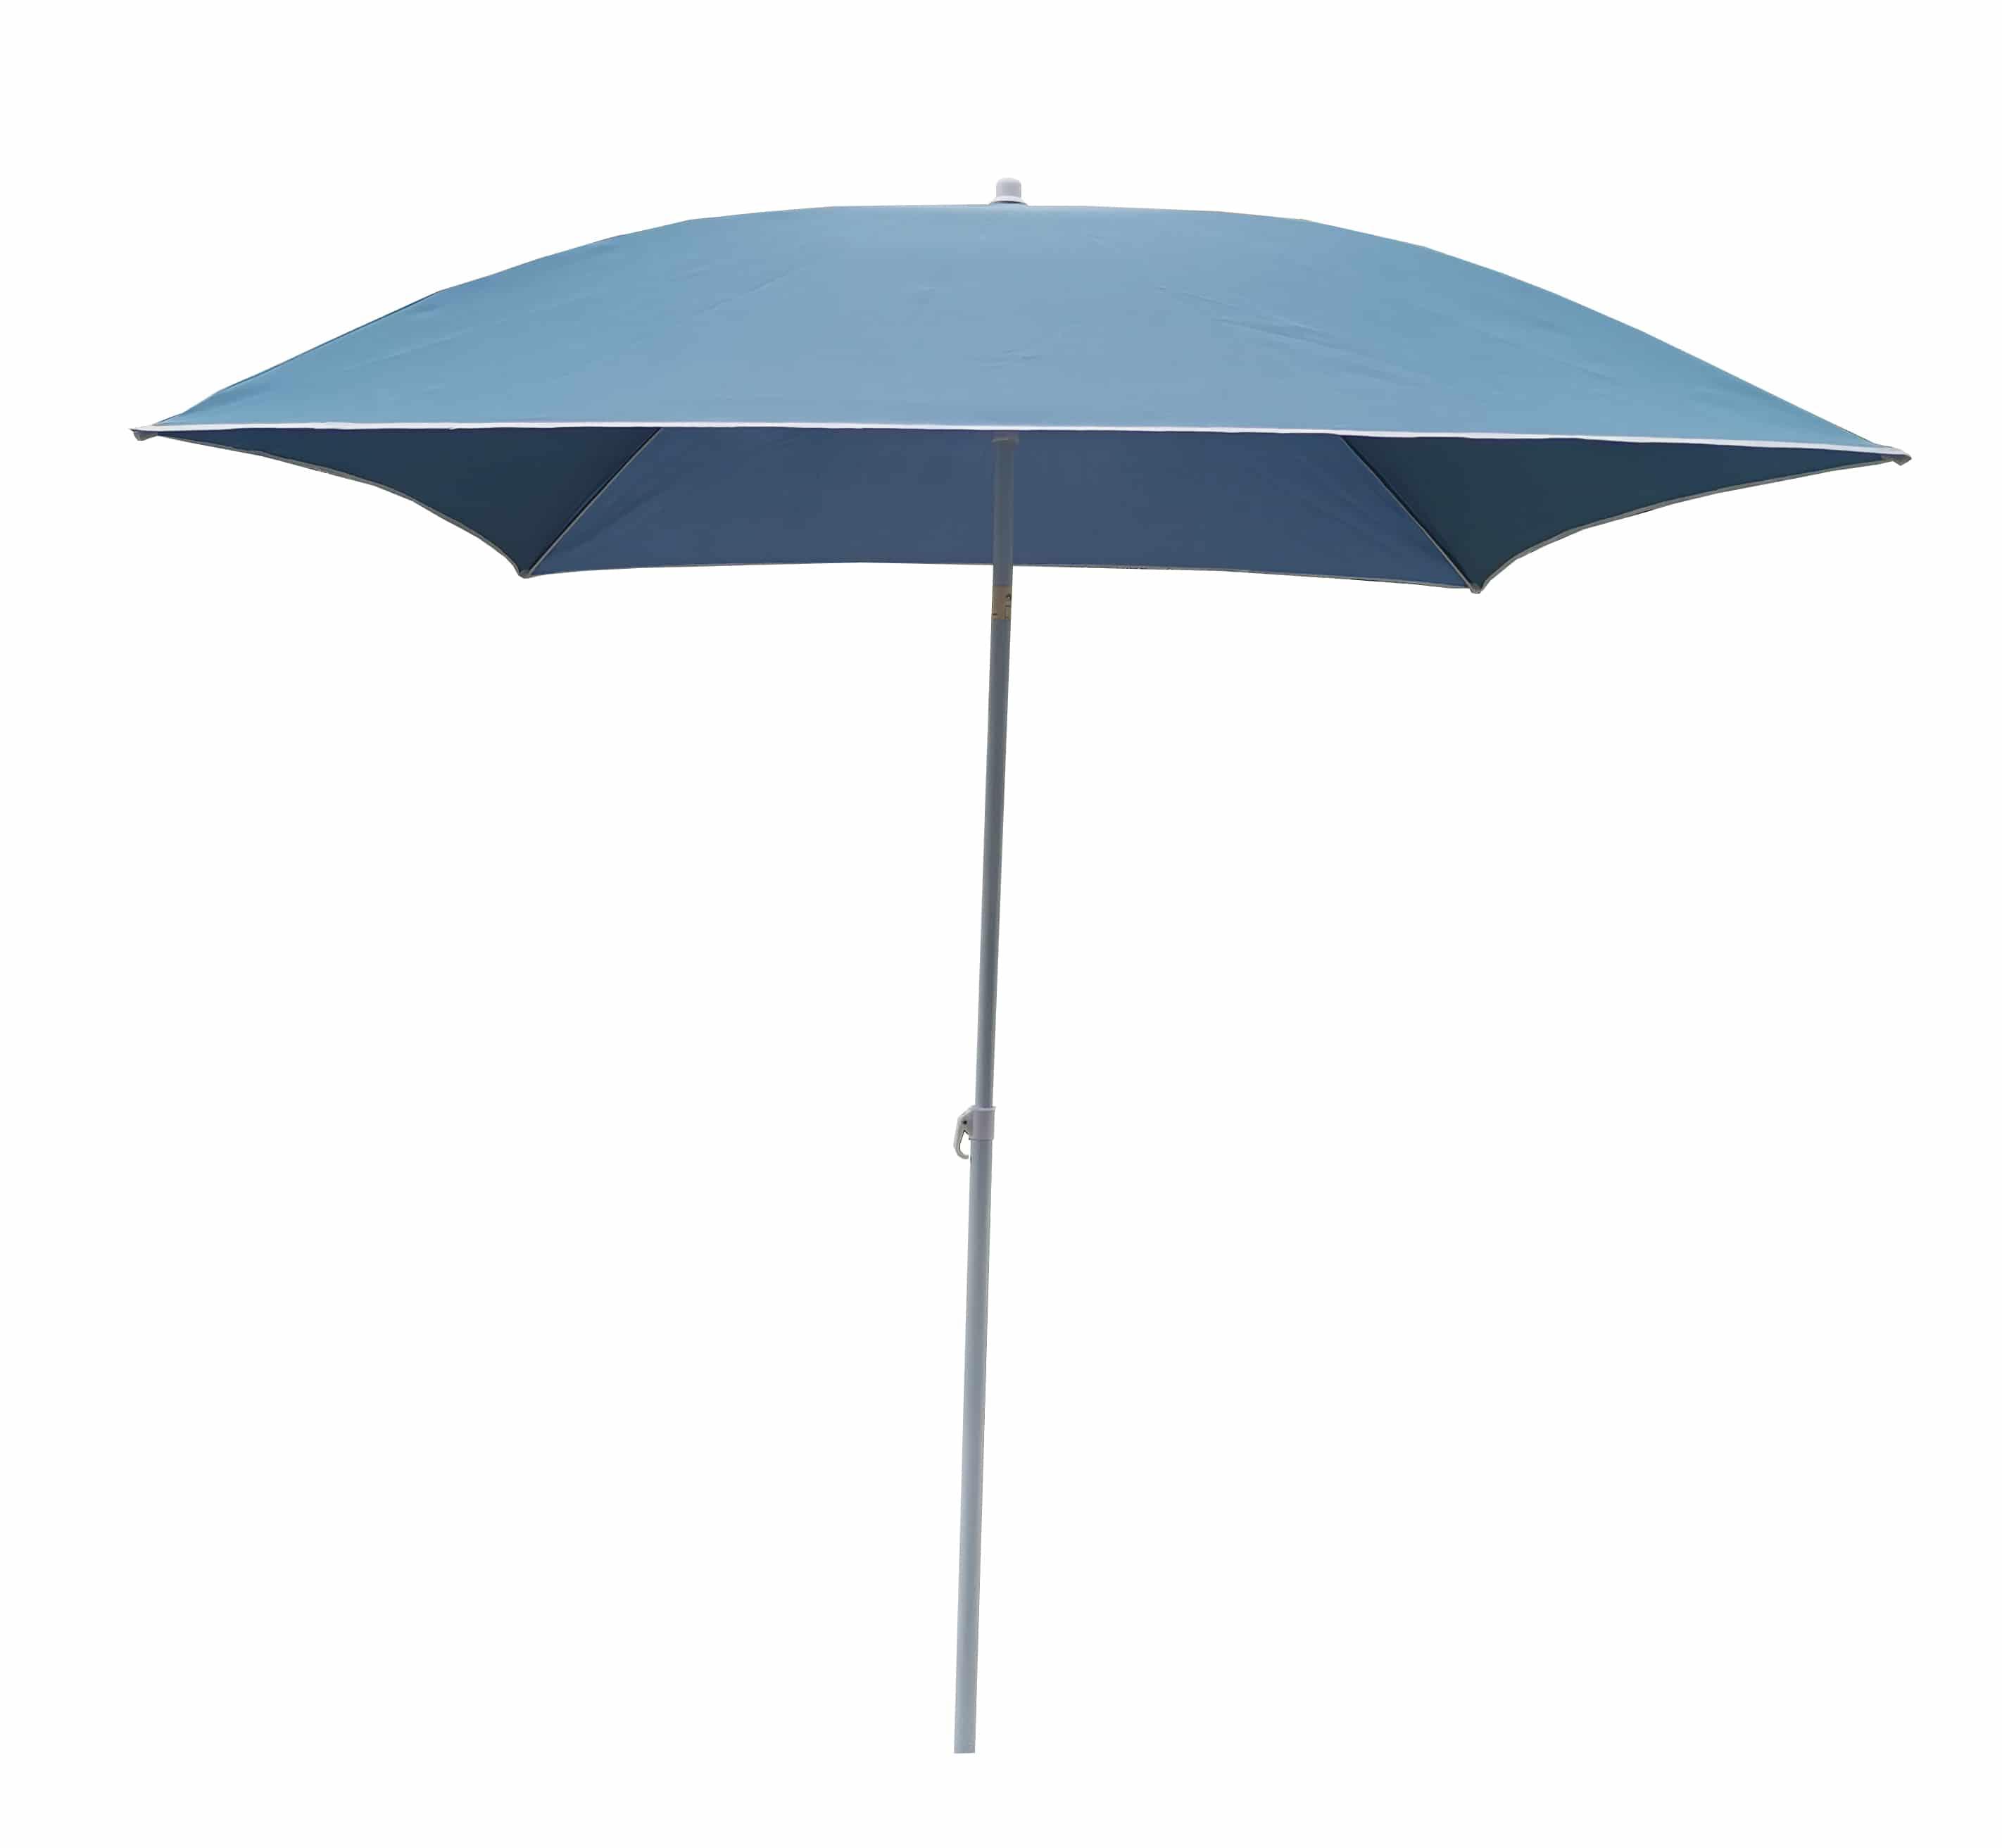 4goodz Strandparasol/Balkonparasol Vierkant - 180x180x239 cm - Blauw